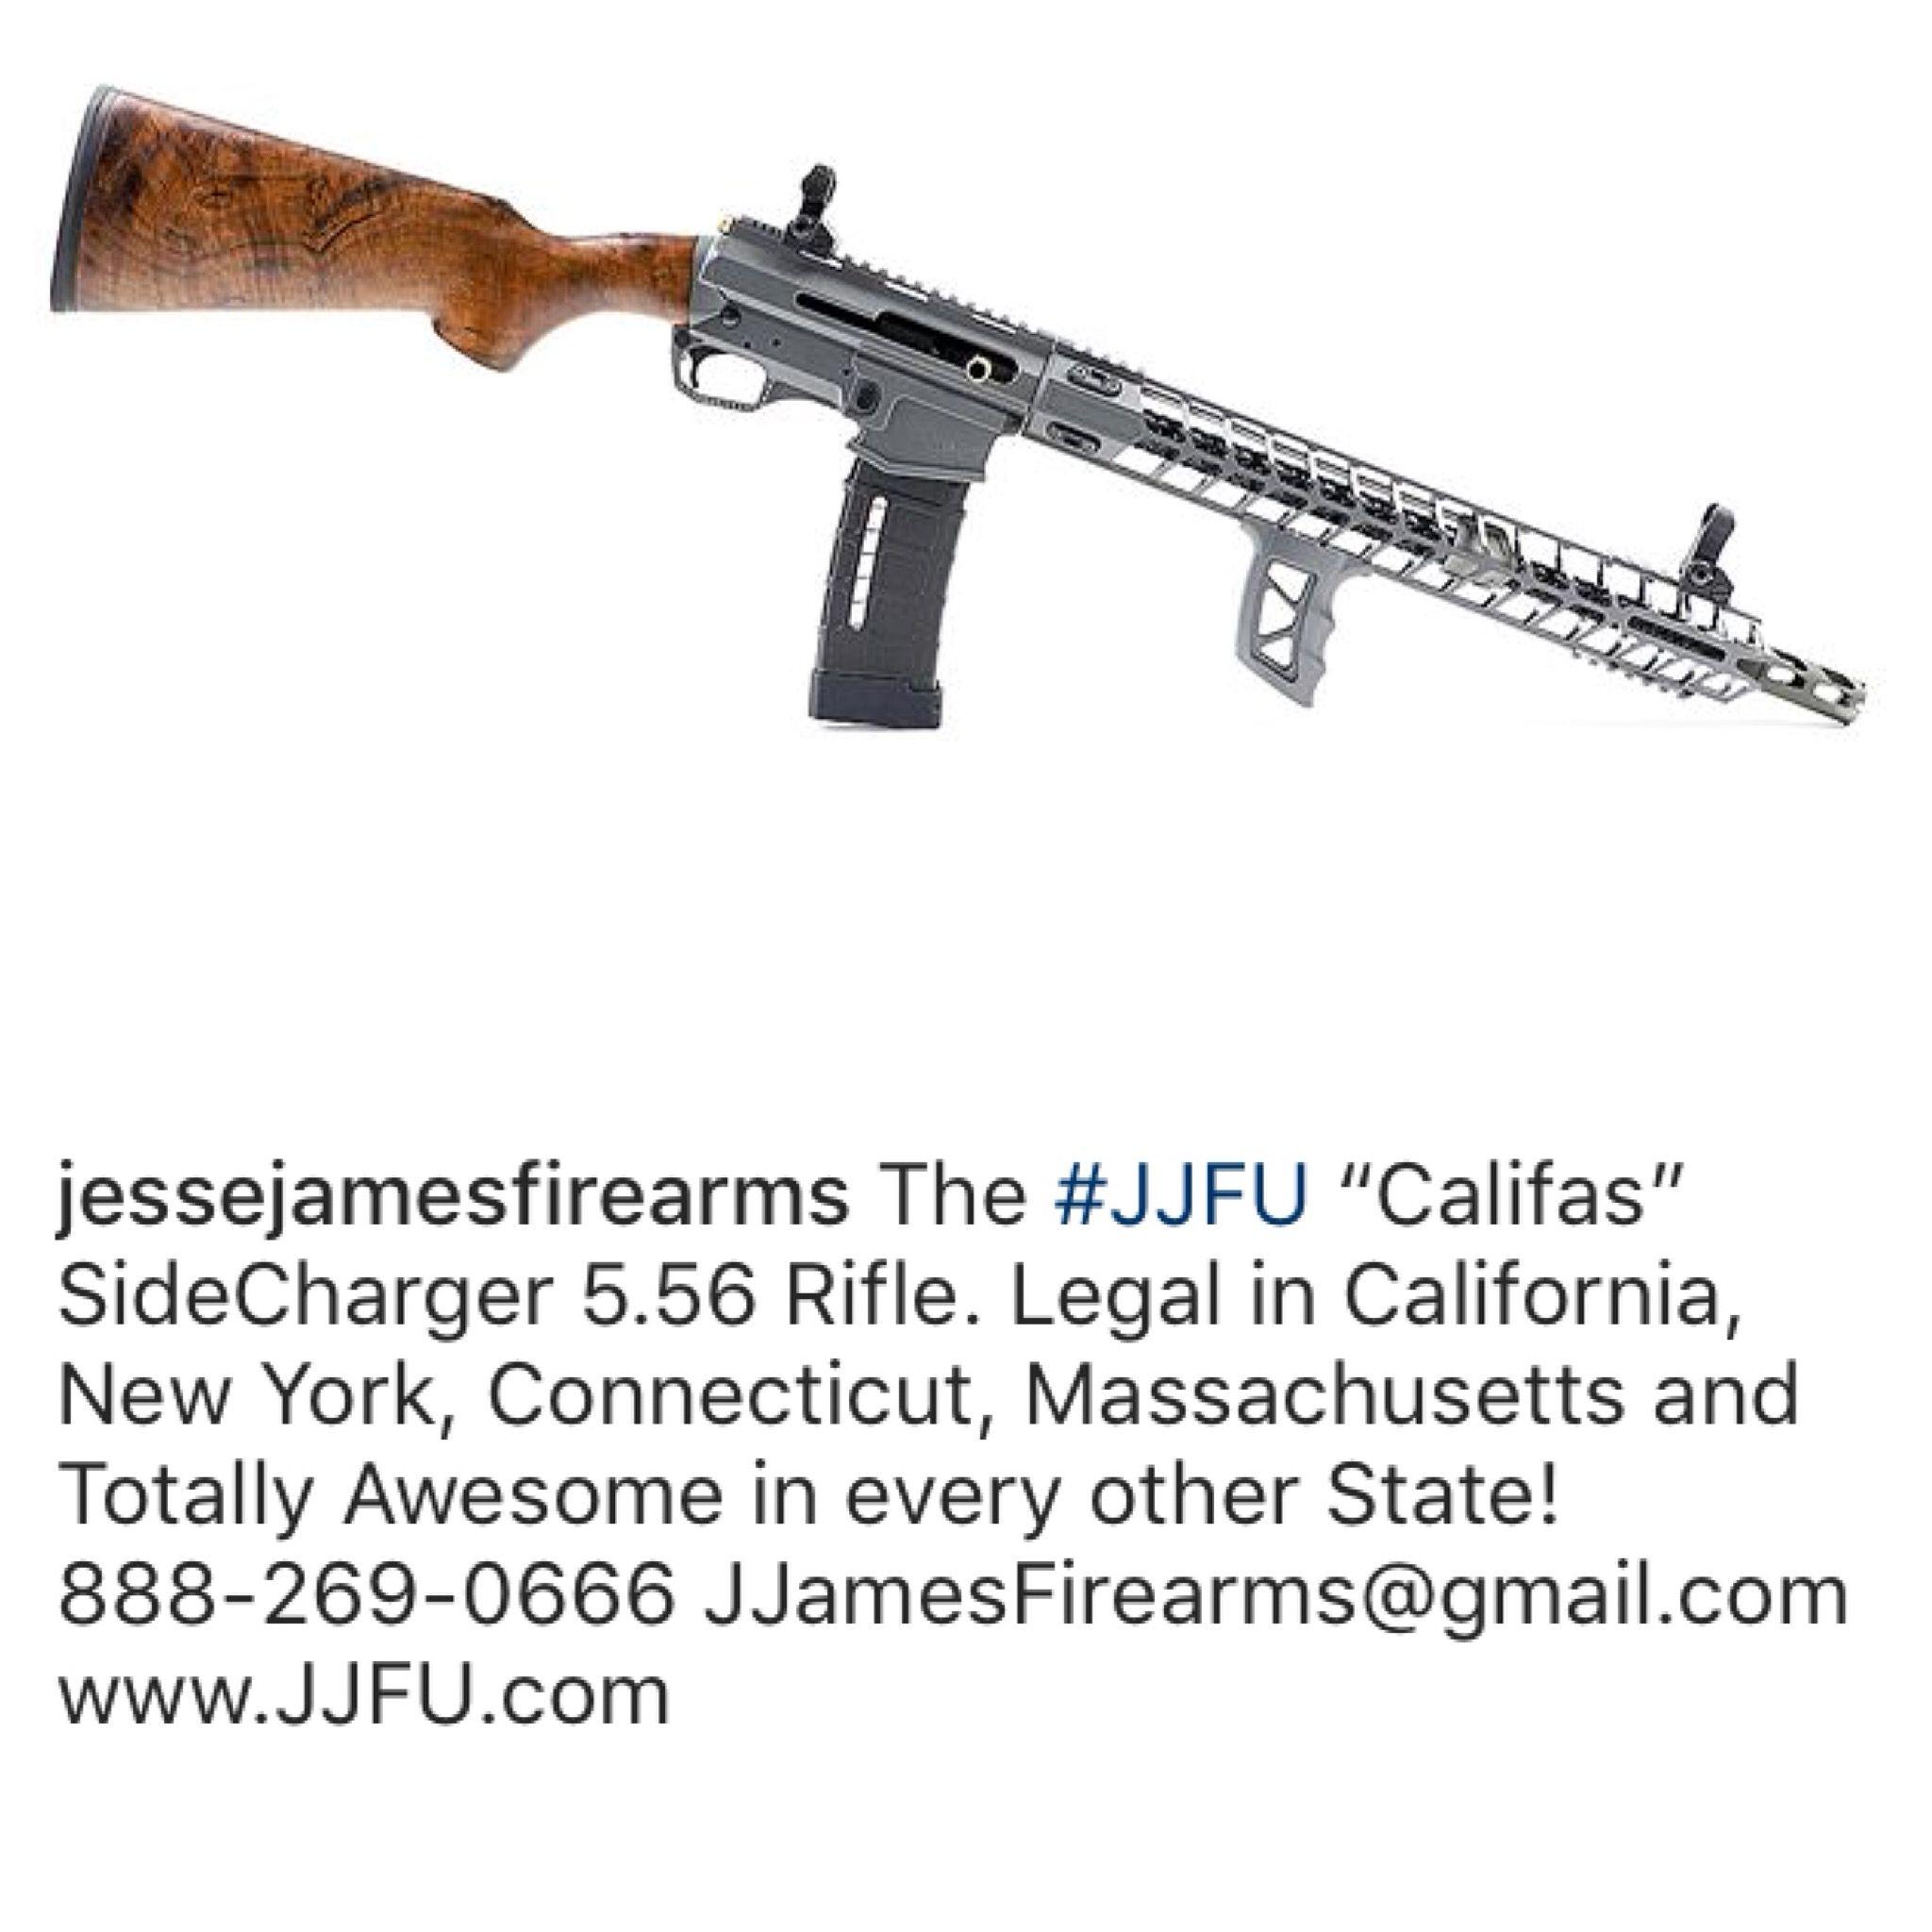 Pin on Guns and Rifles